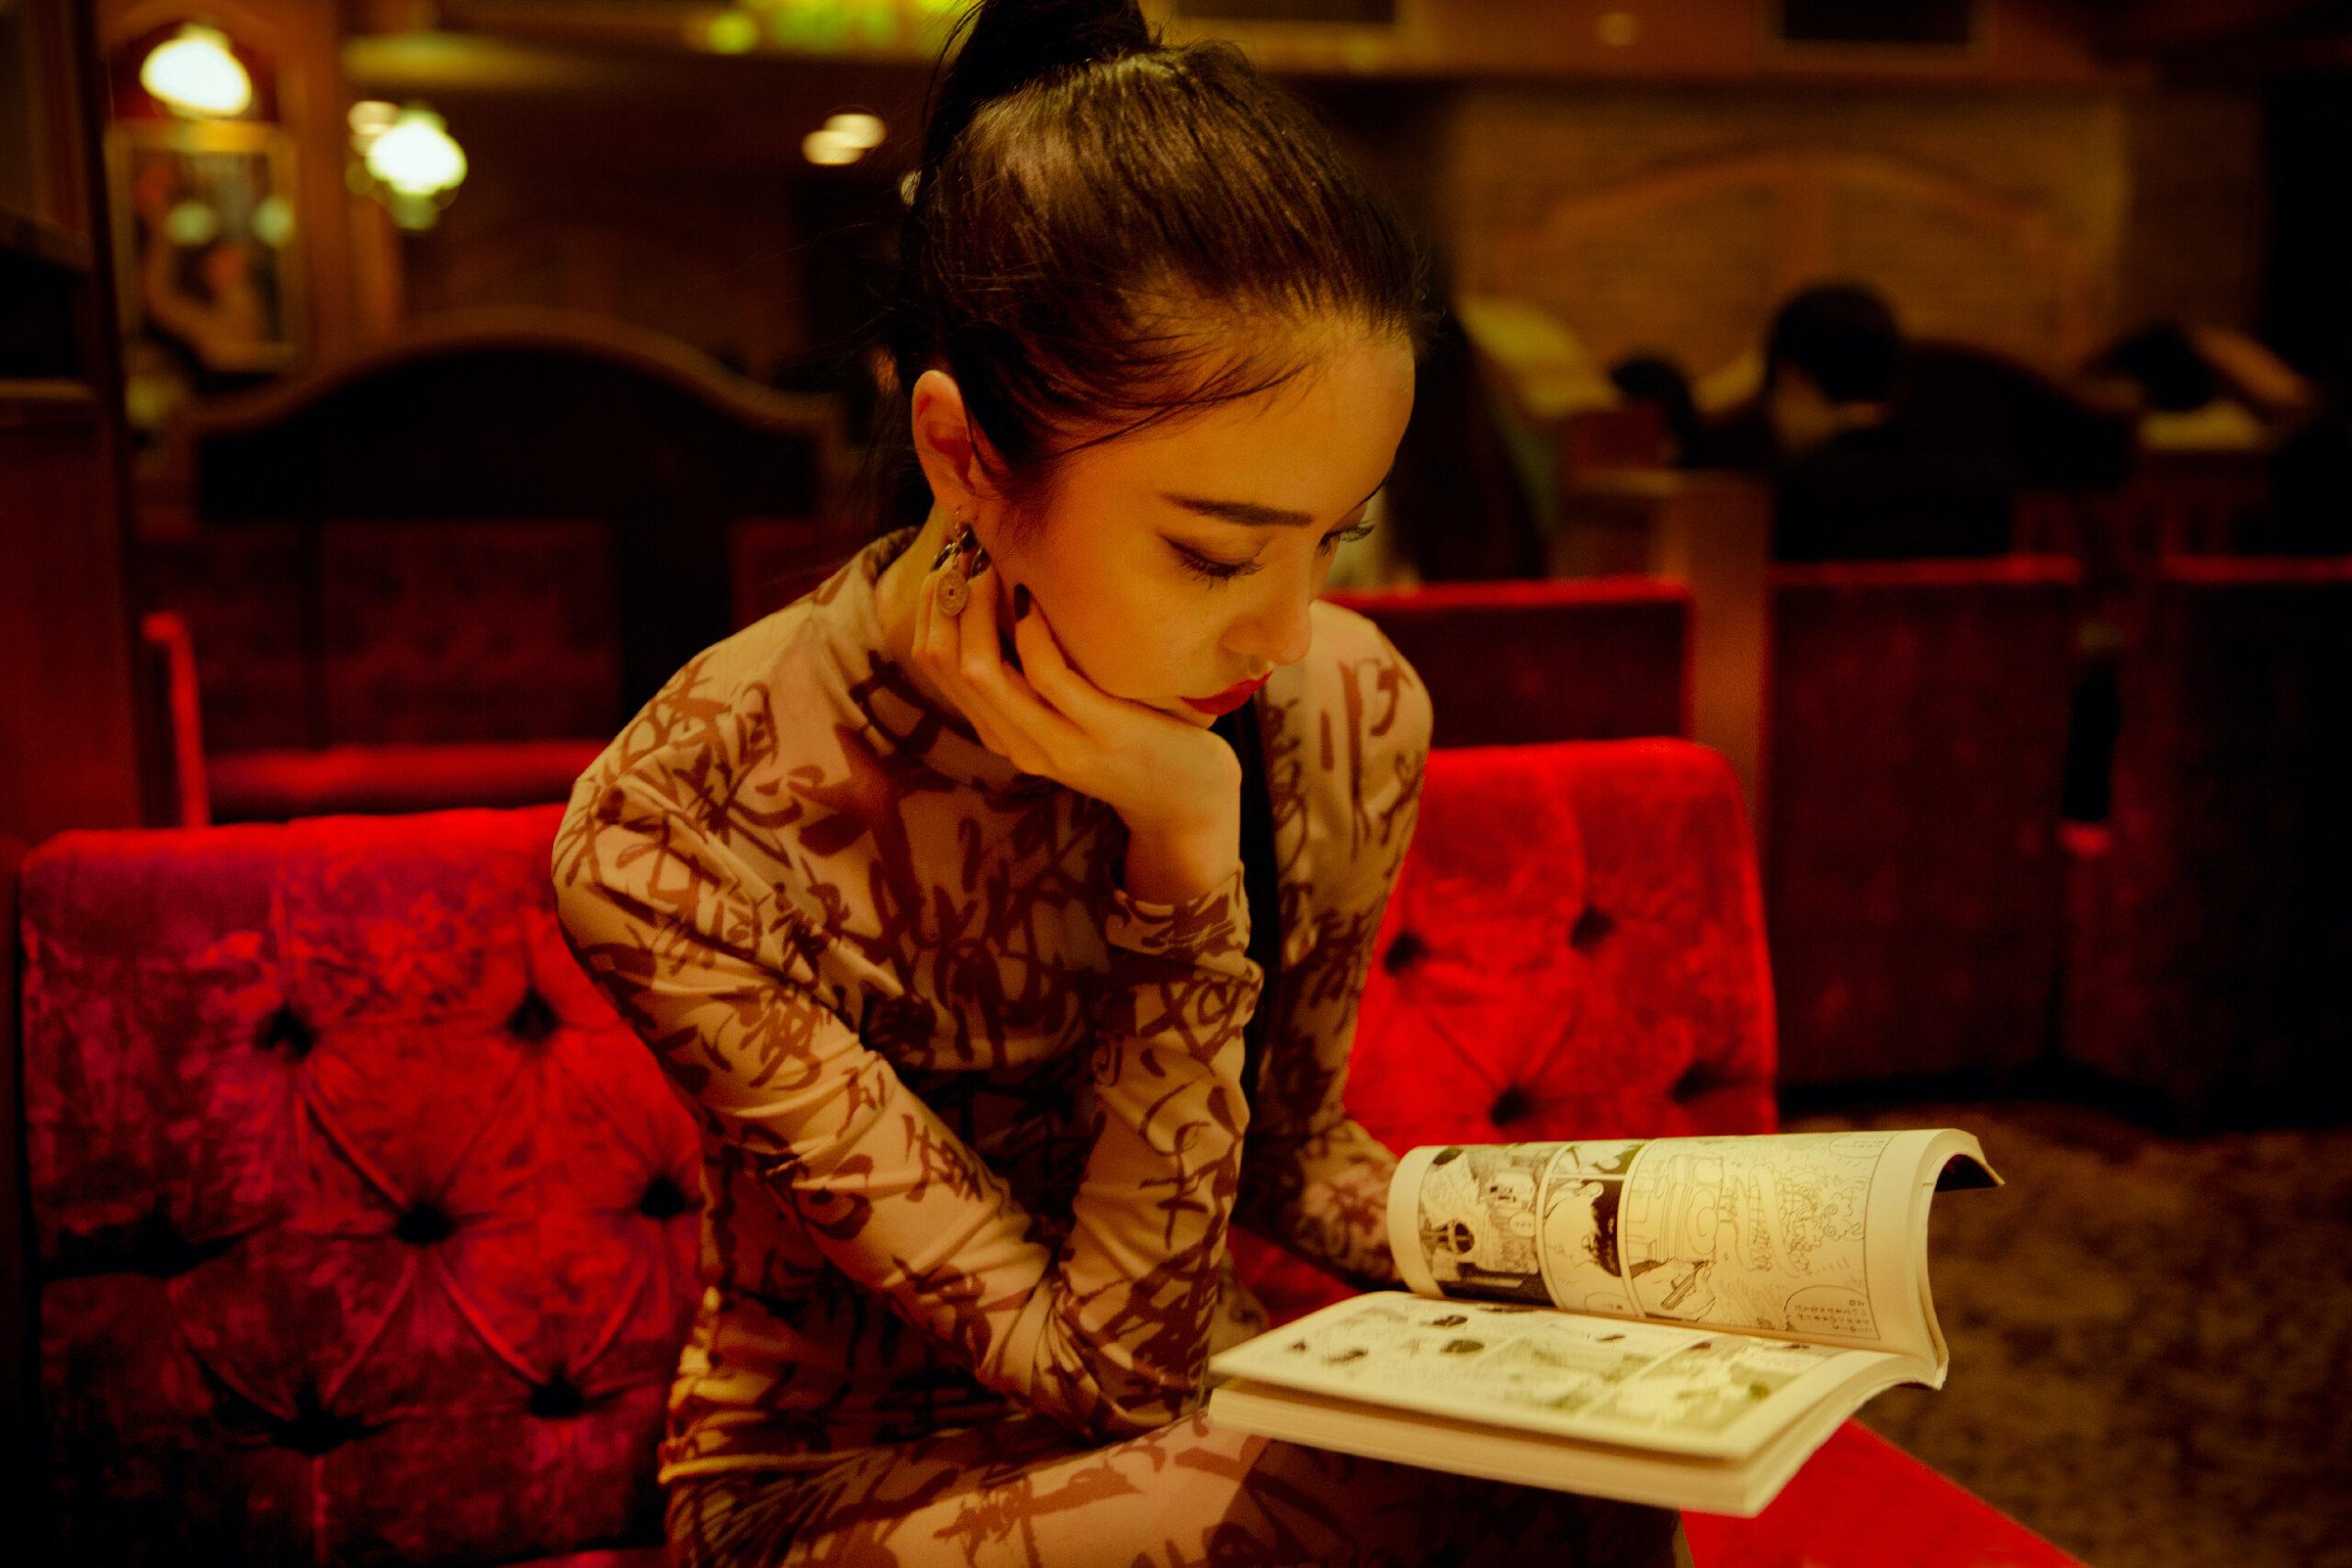 aya reading a manga